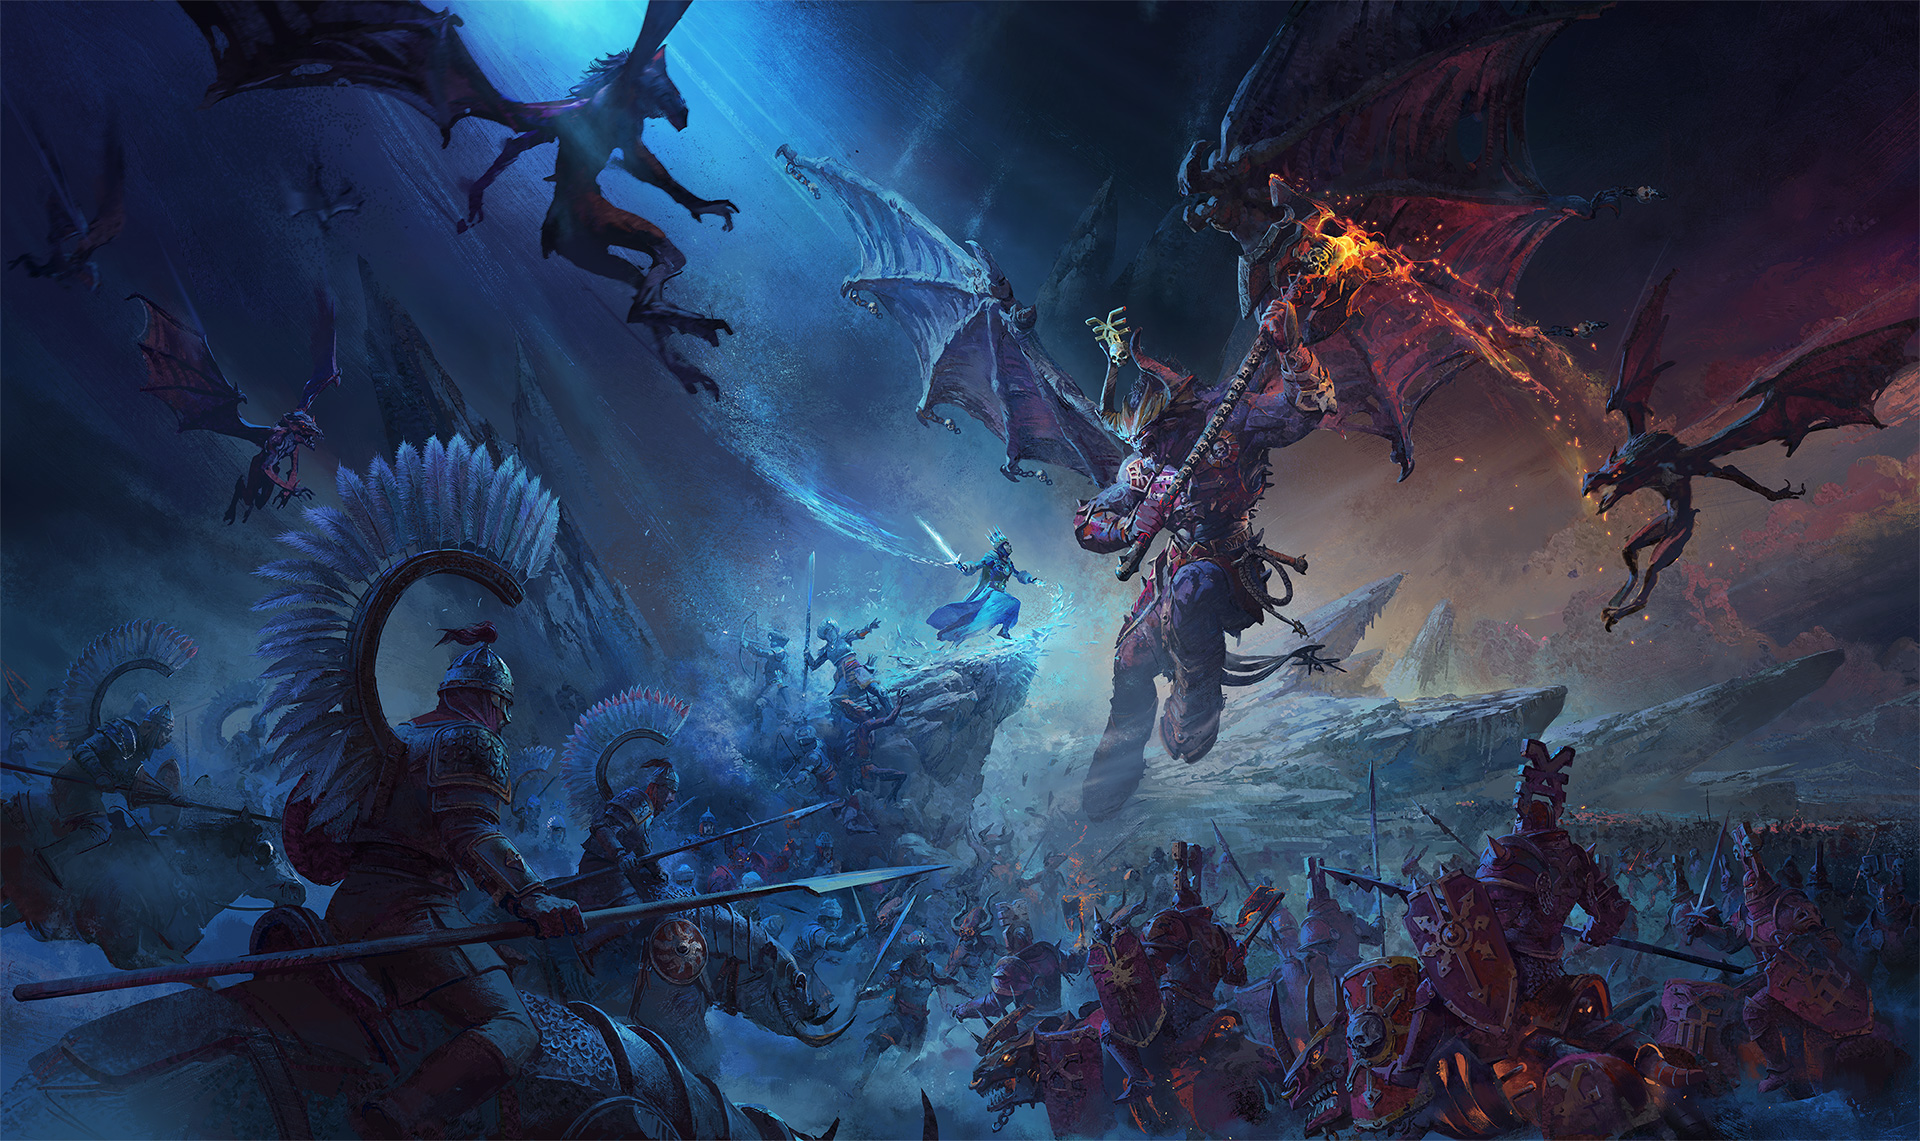 Total War: Warhammer III looks sick in its first cinematic trailer screenshot